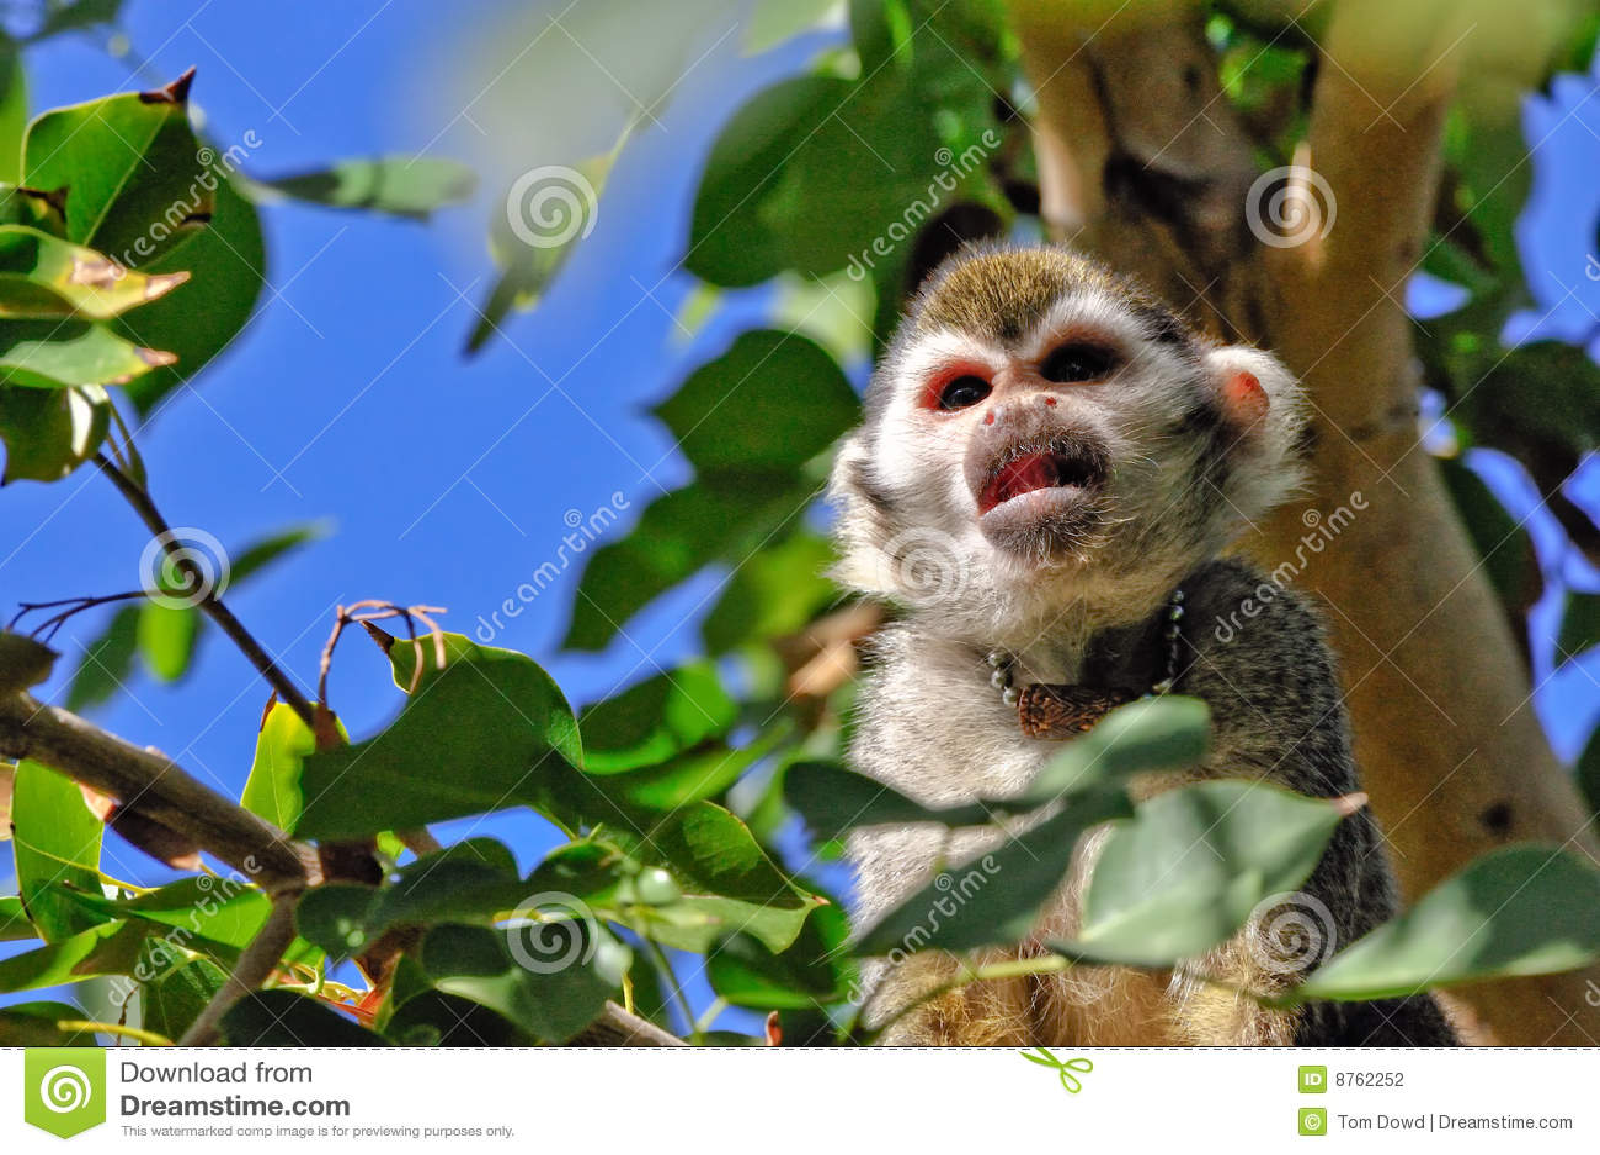 Squirrel monkeys in trees - photo#25